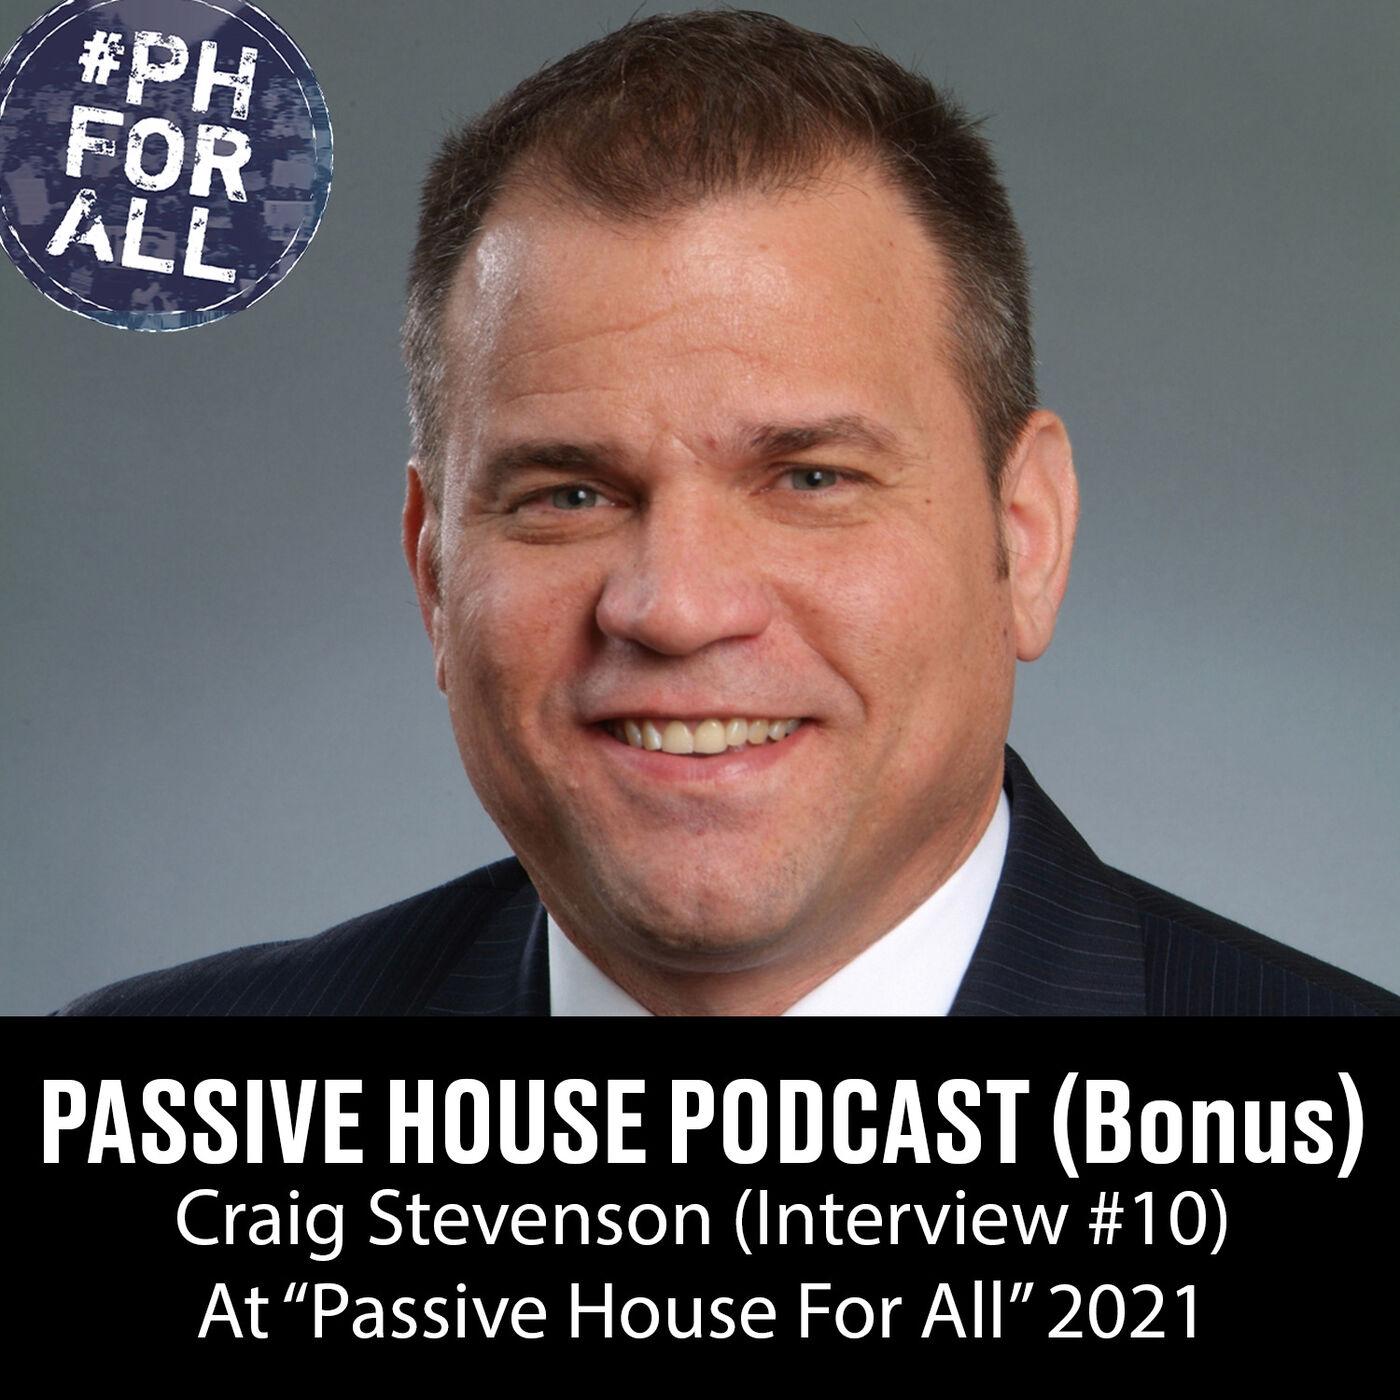 Bonus: Craig Stevenson at Passive House For All Conference (Interview #10)